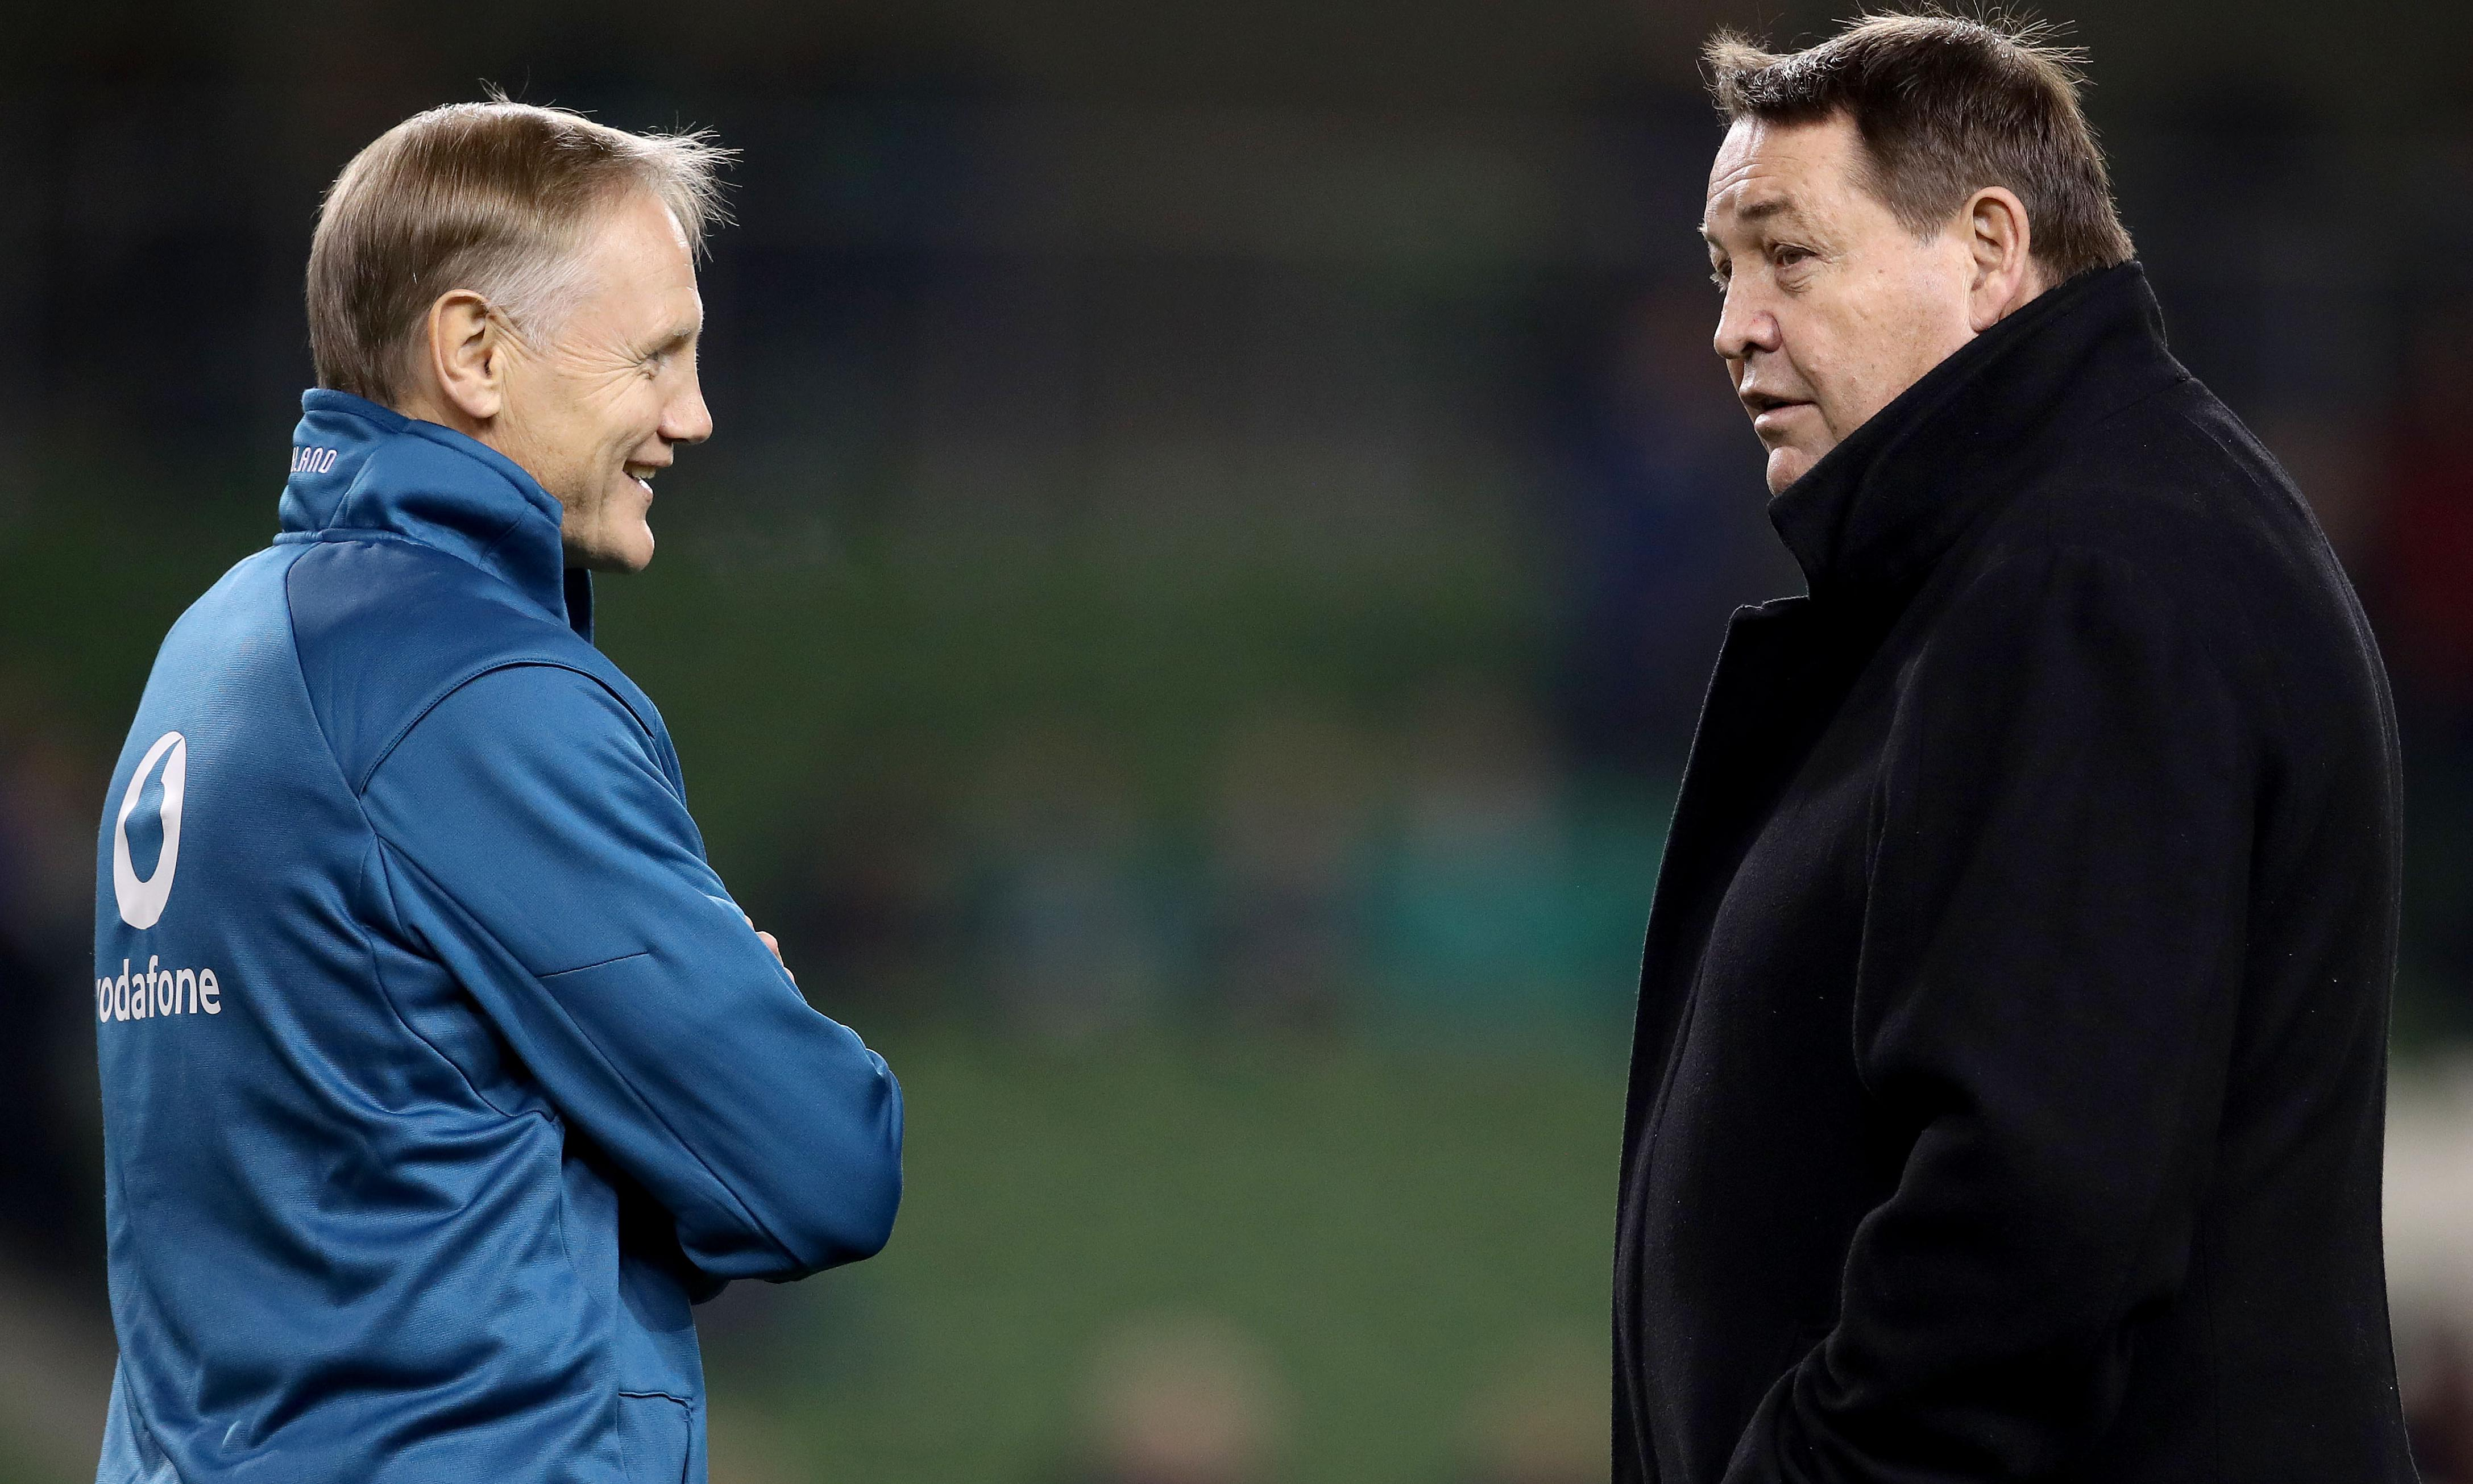 Steve Hansen decision could lead to Ireland's Joe Schmidt joining All Blacks